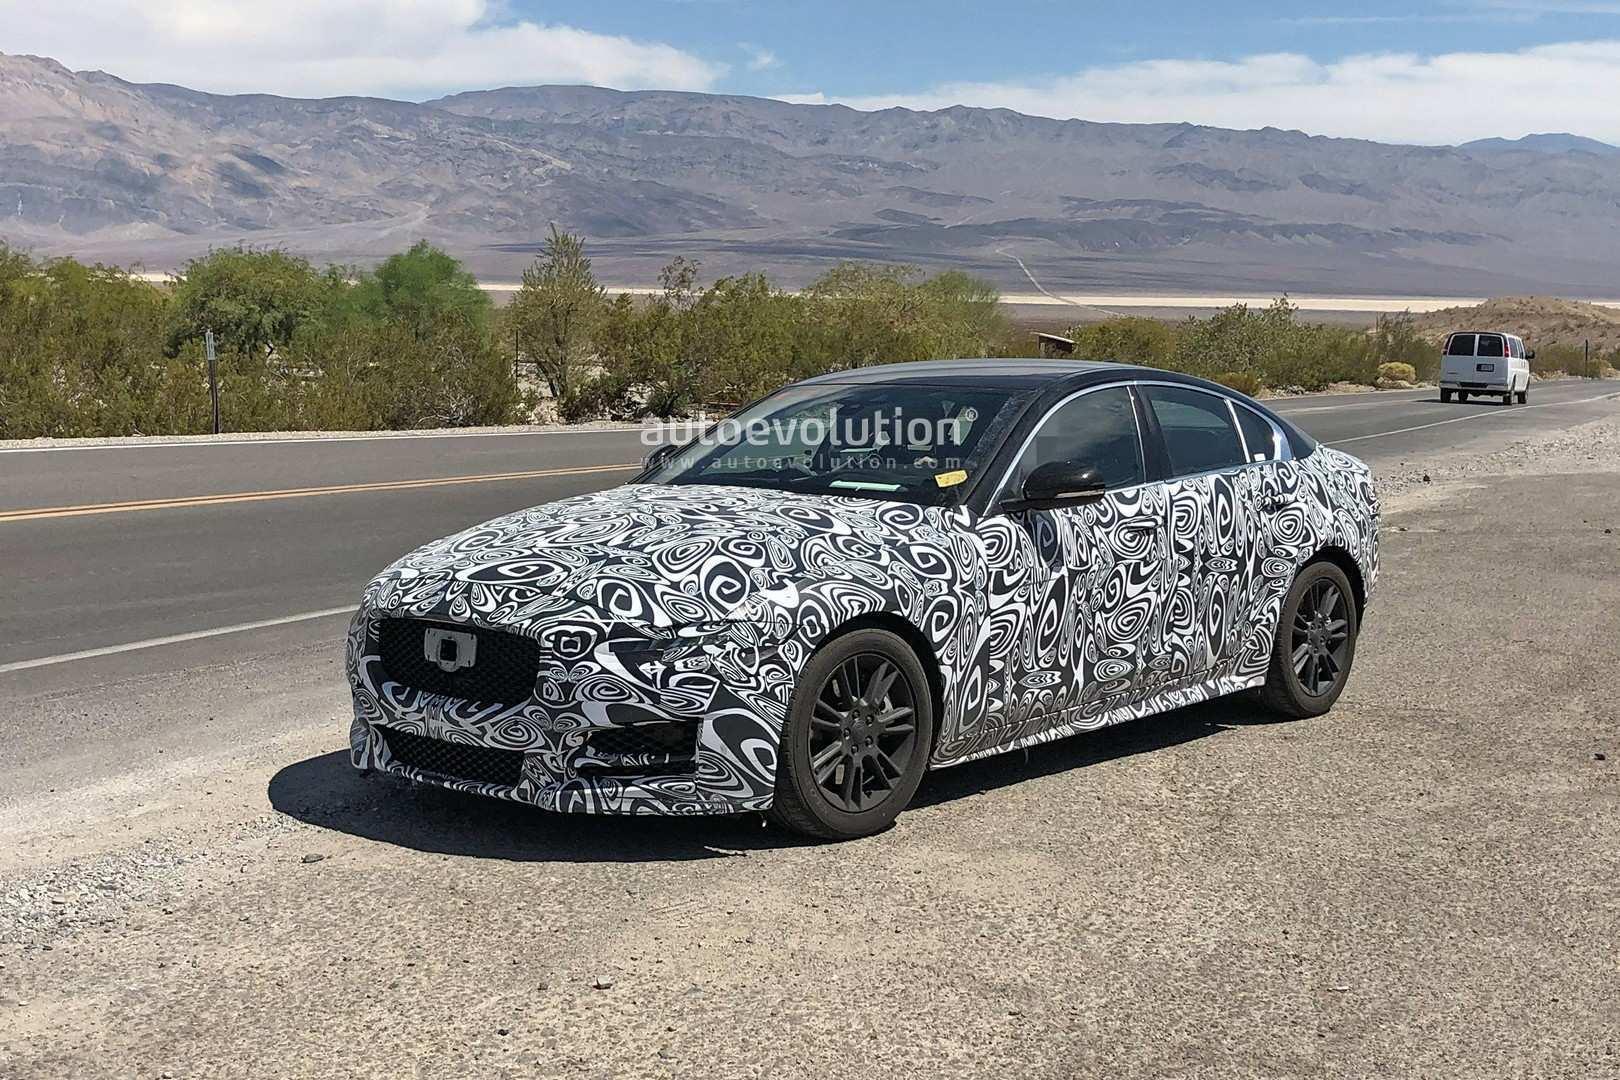 17 New 2020 Jaguar XF Price by 2020 Jaguar XF